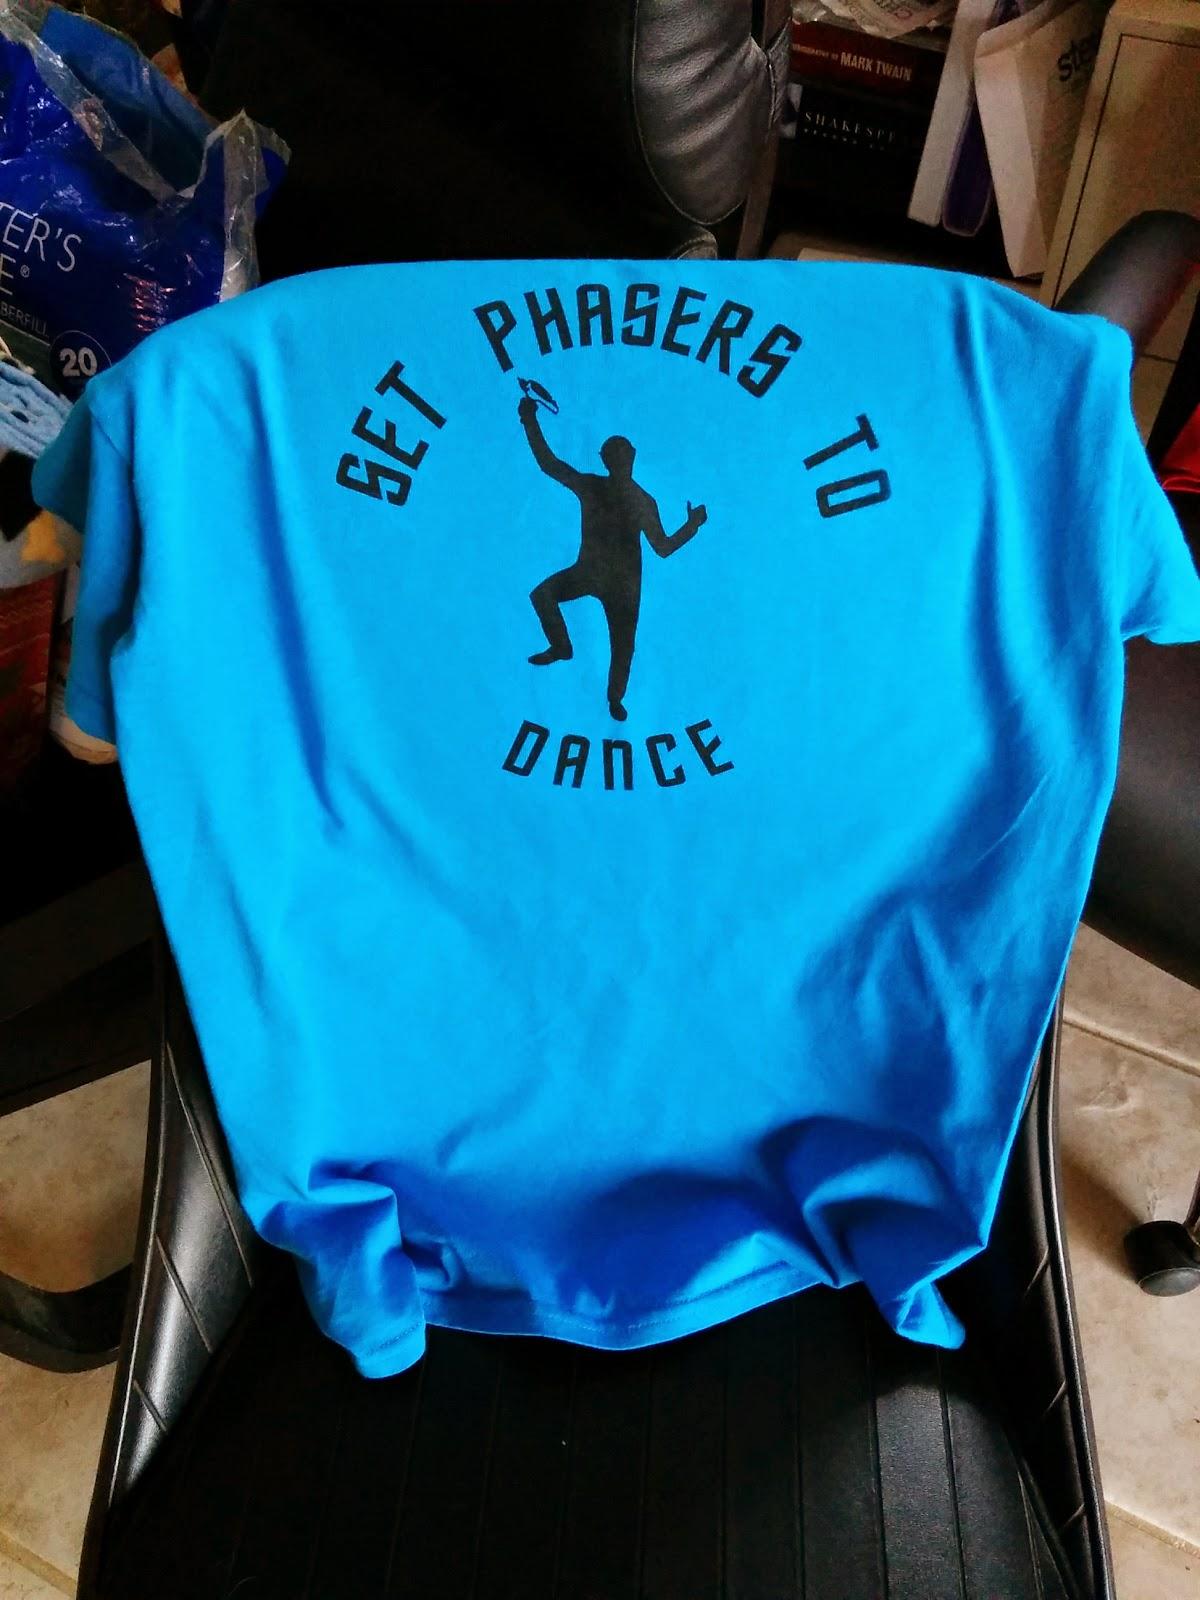 screen printed t-shirt set phasers to dance star trek